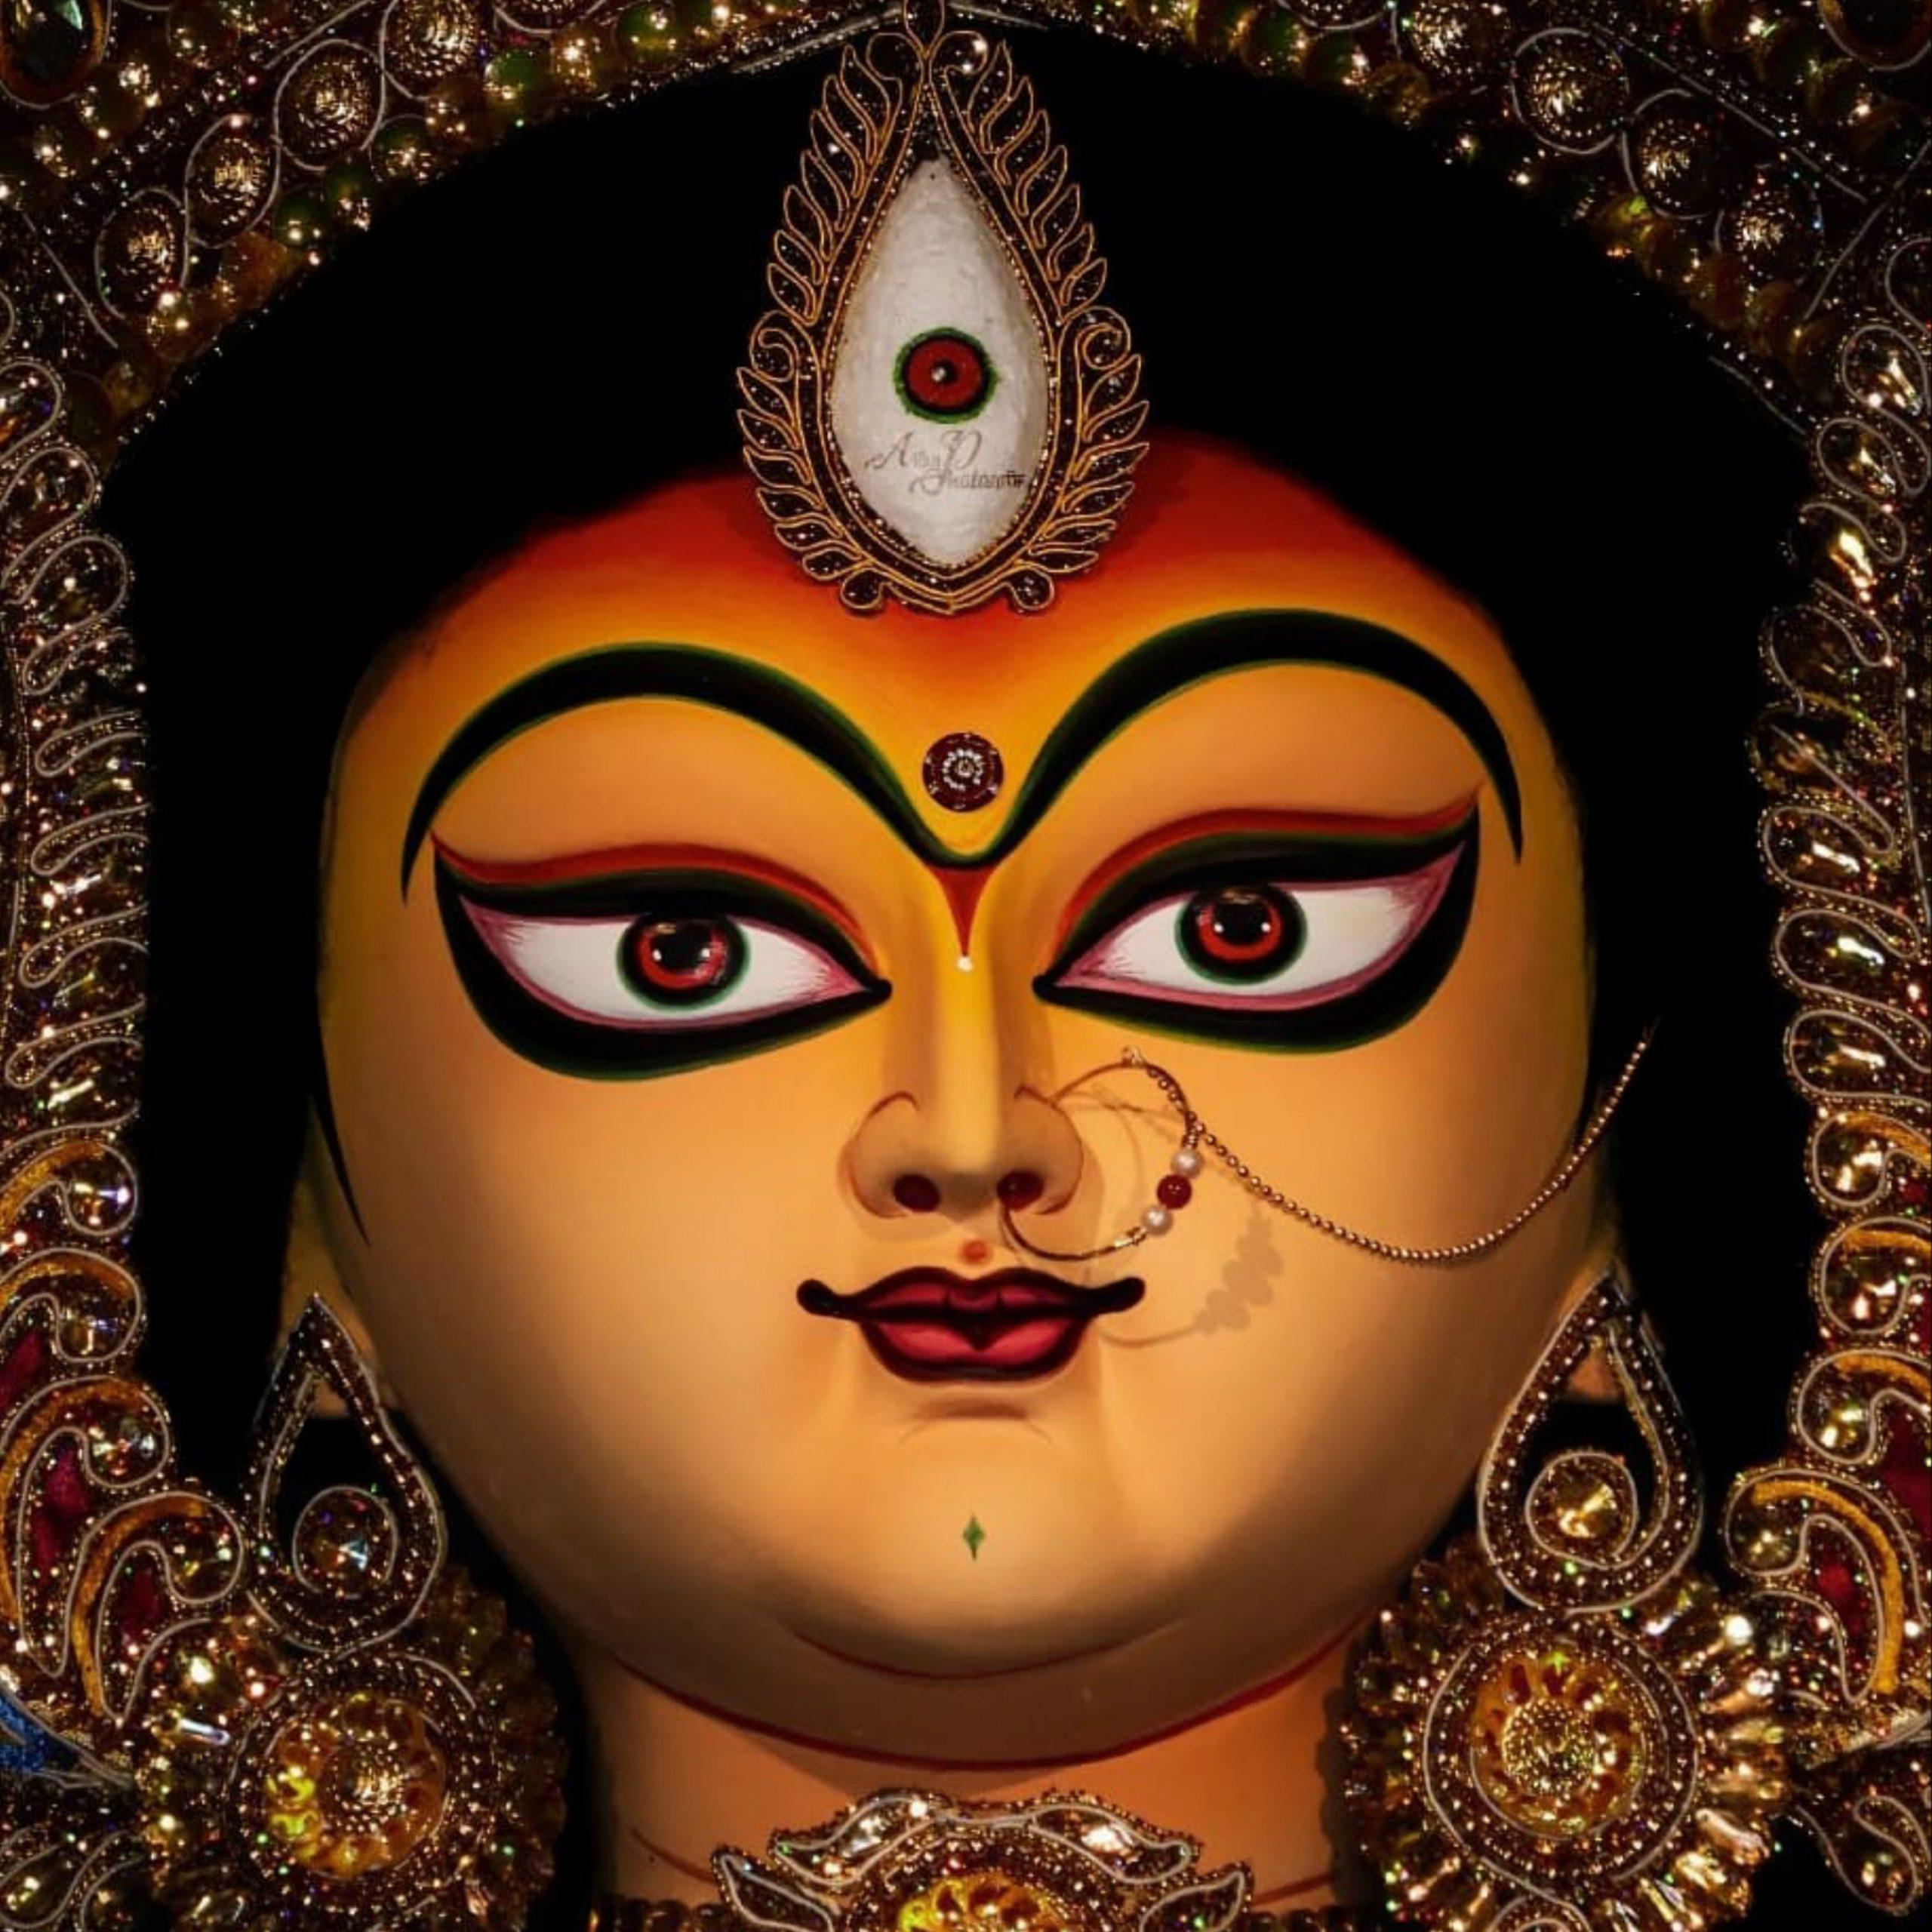 Face of Goddess Durga